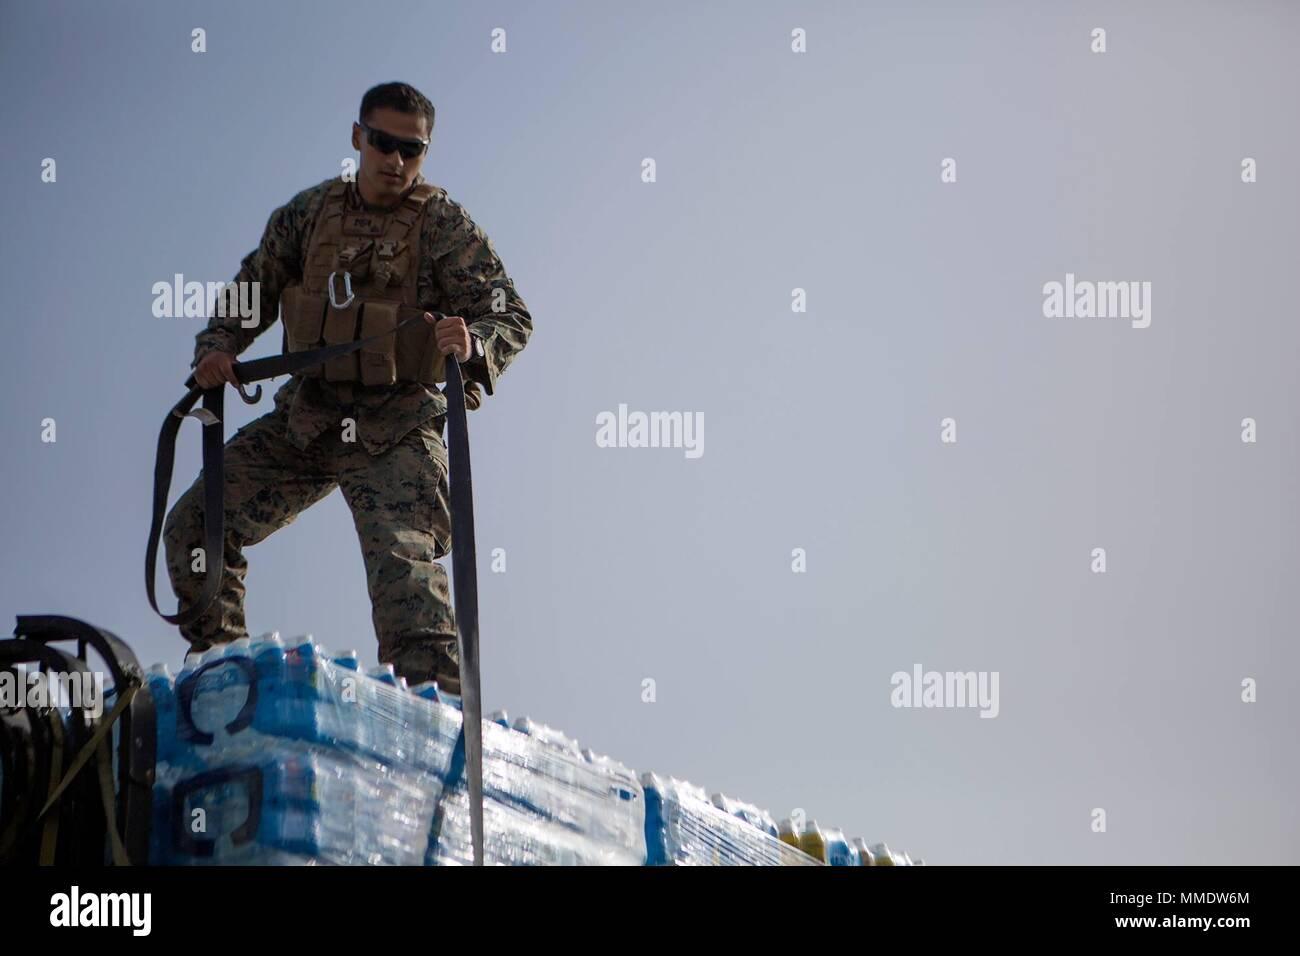 Us Marine Corps Cpl Adan Arroyo Mit Bekampfung Logistik Bataillon